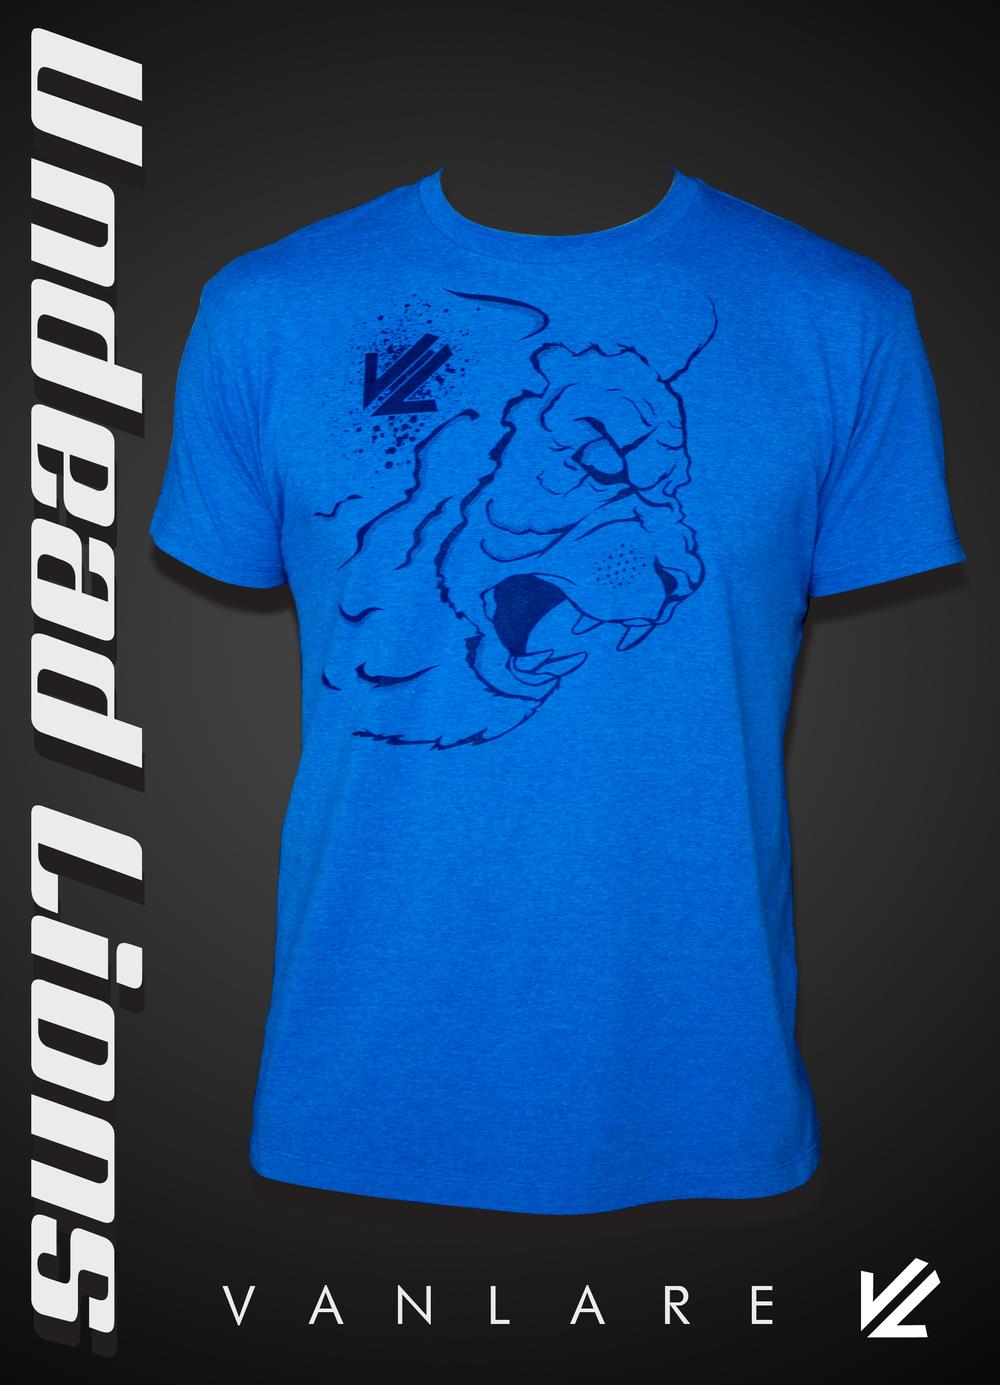 VL LIONS BLUE SHIRT.jpg